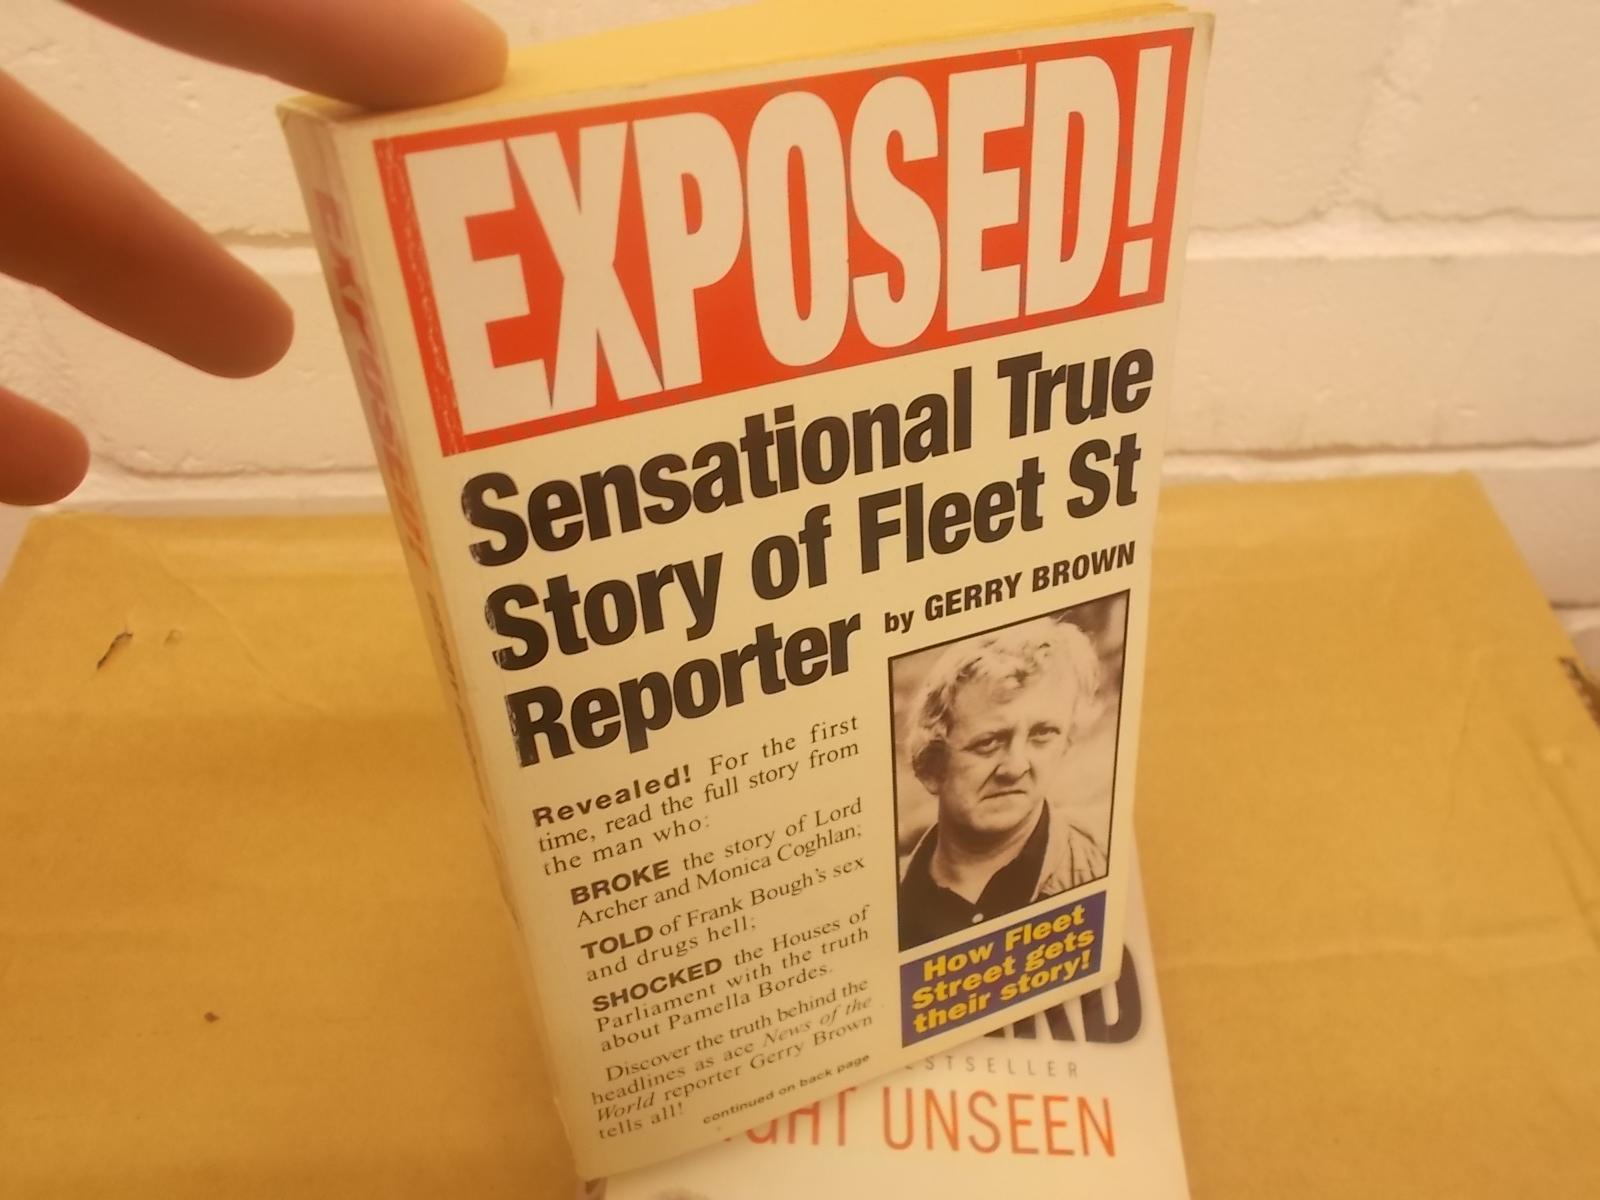 Exposed!: Sensational True Story of a Fleet